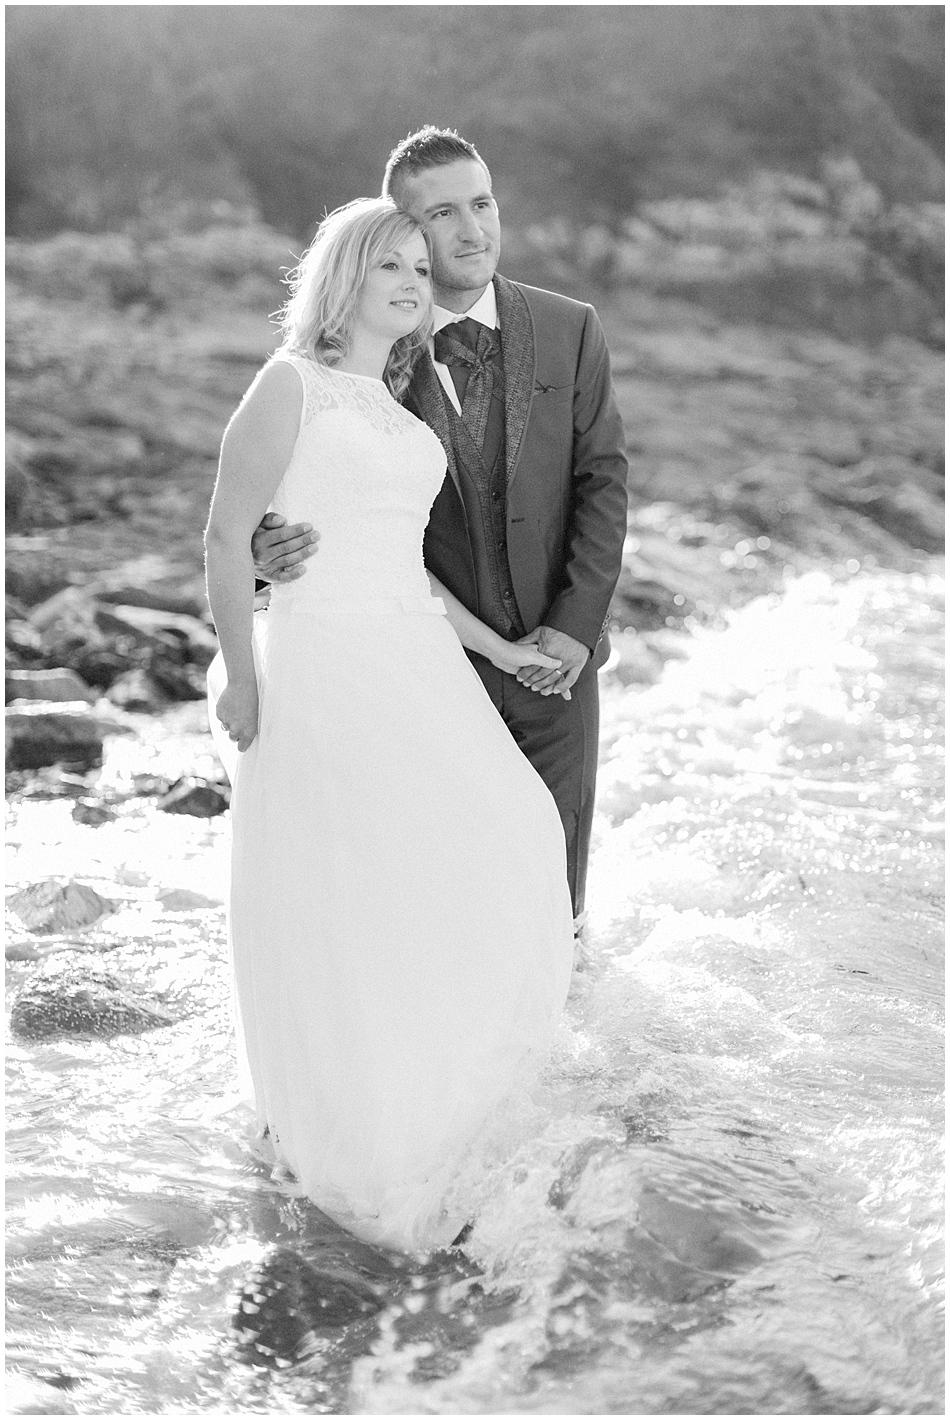 Marie-Alice G-Photographe Mariage France Normandie - Photographe Mariage Manche valognes cherbourg - Wedding Photographer France_0169